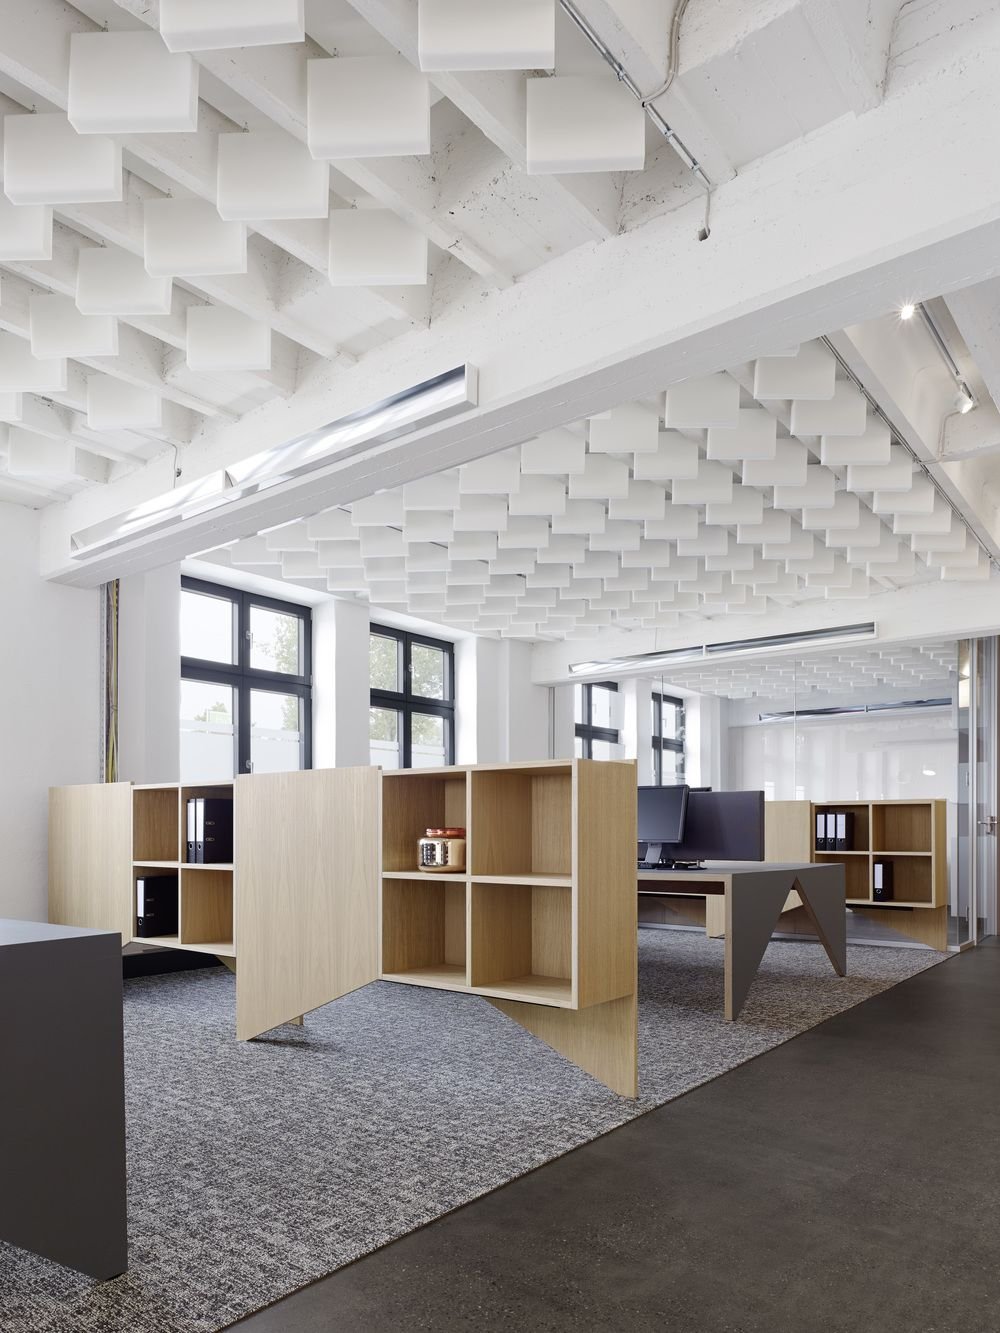 Innenarchitektur stuttgart b ro office movet office loft arbeitswelt nachhaltigkeit - Innenarchitektur stuttgart ...